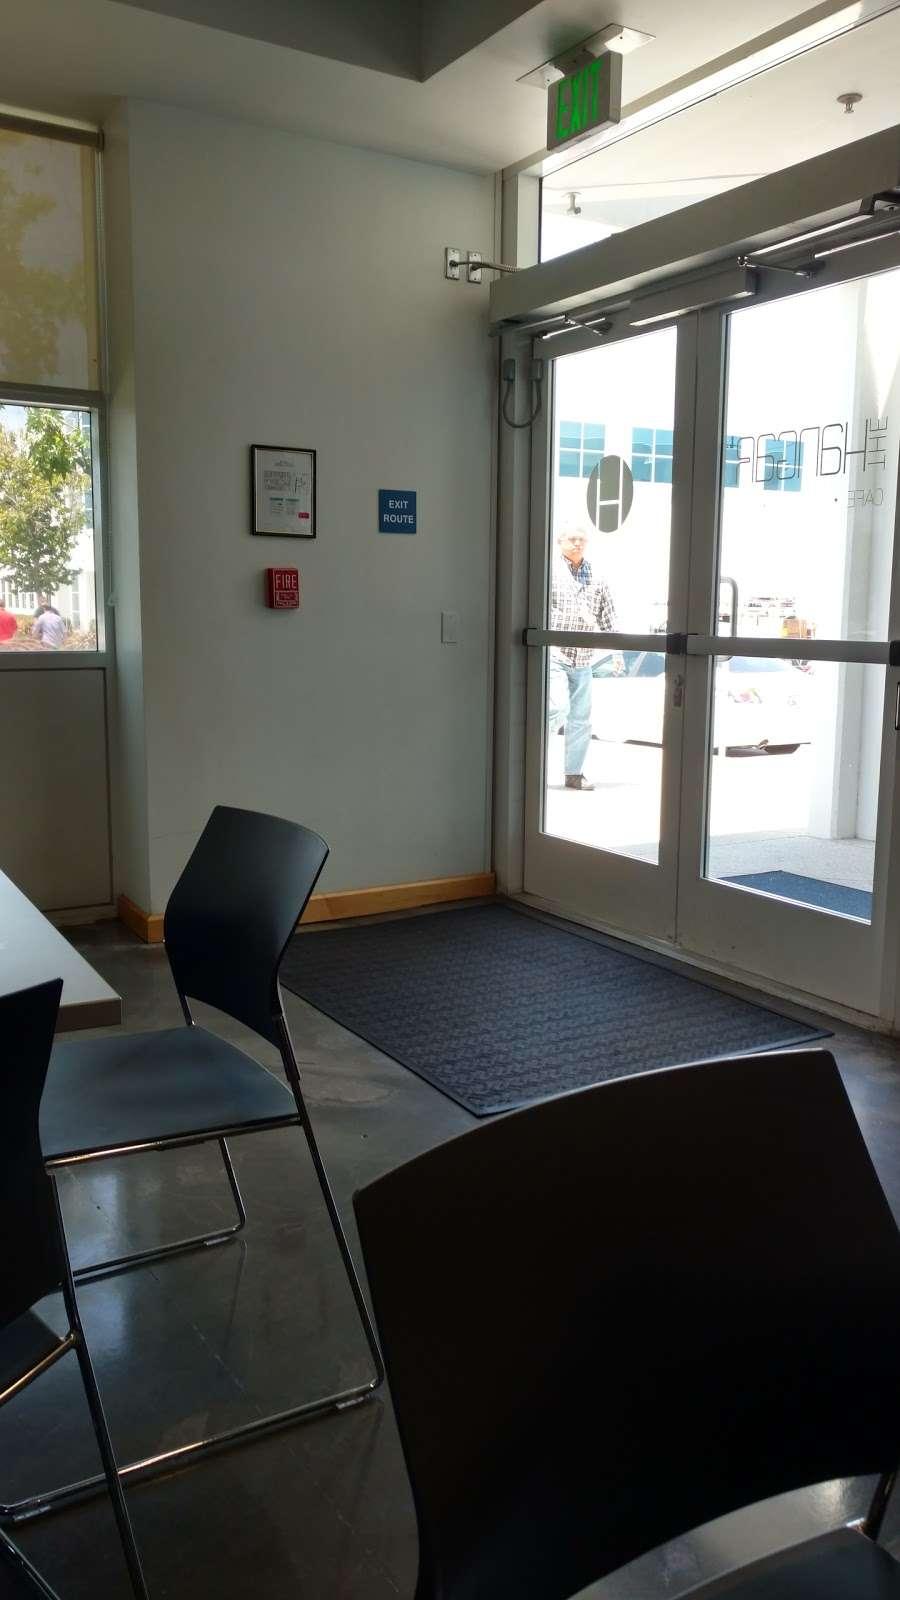 The Hangar - cafe  | Photo 5 of 10 | Address: 26140 Enterprise Way, Lake Forest, CA 92630, USA | Phone: (949) 455-2750